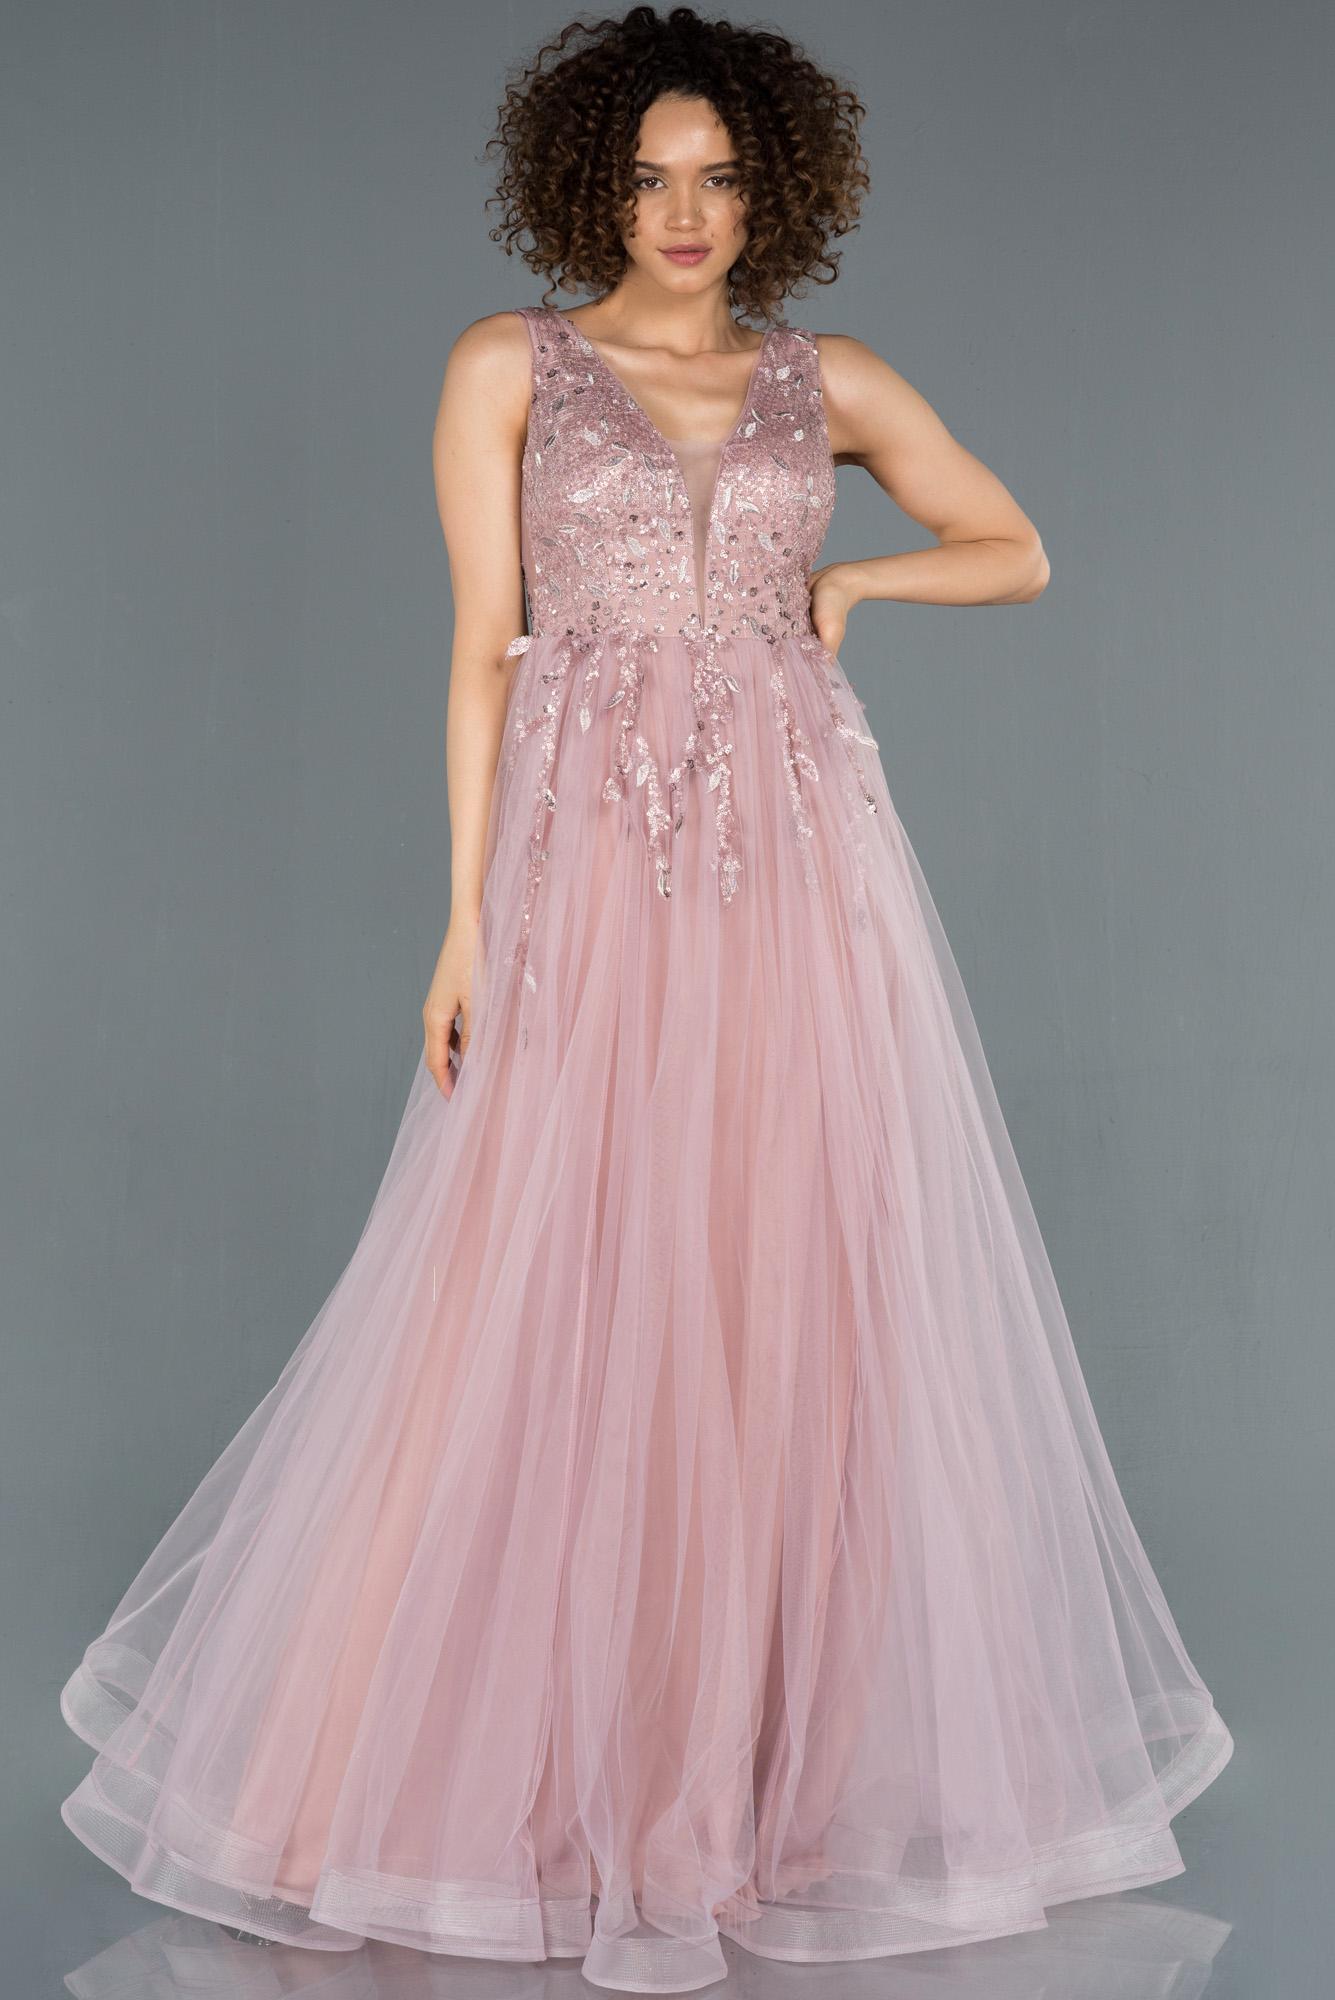 Pudra Işleme Detaylı Prenses Model Abiye